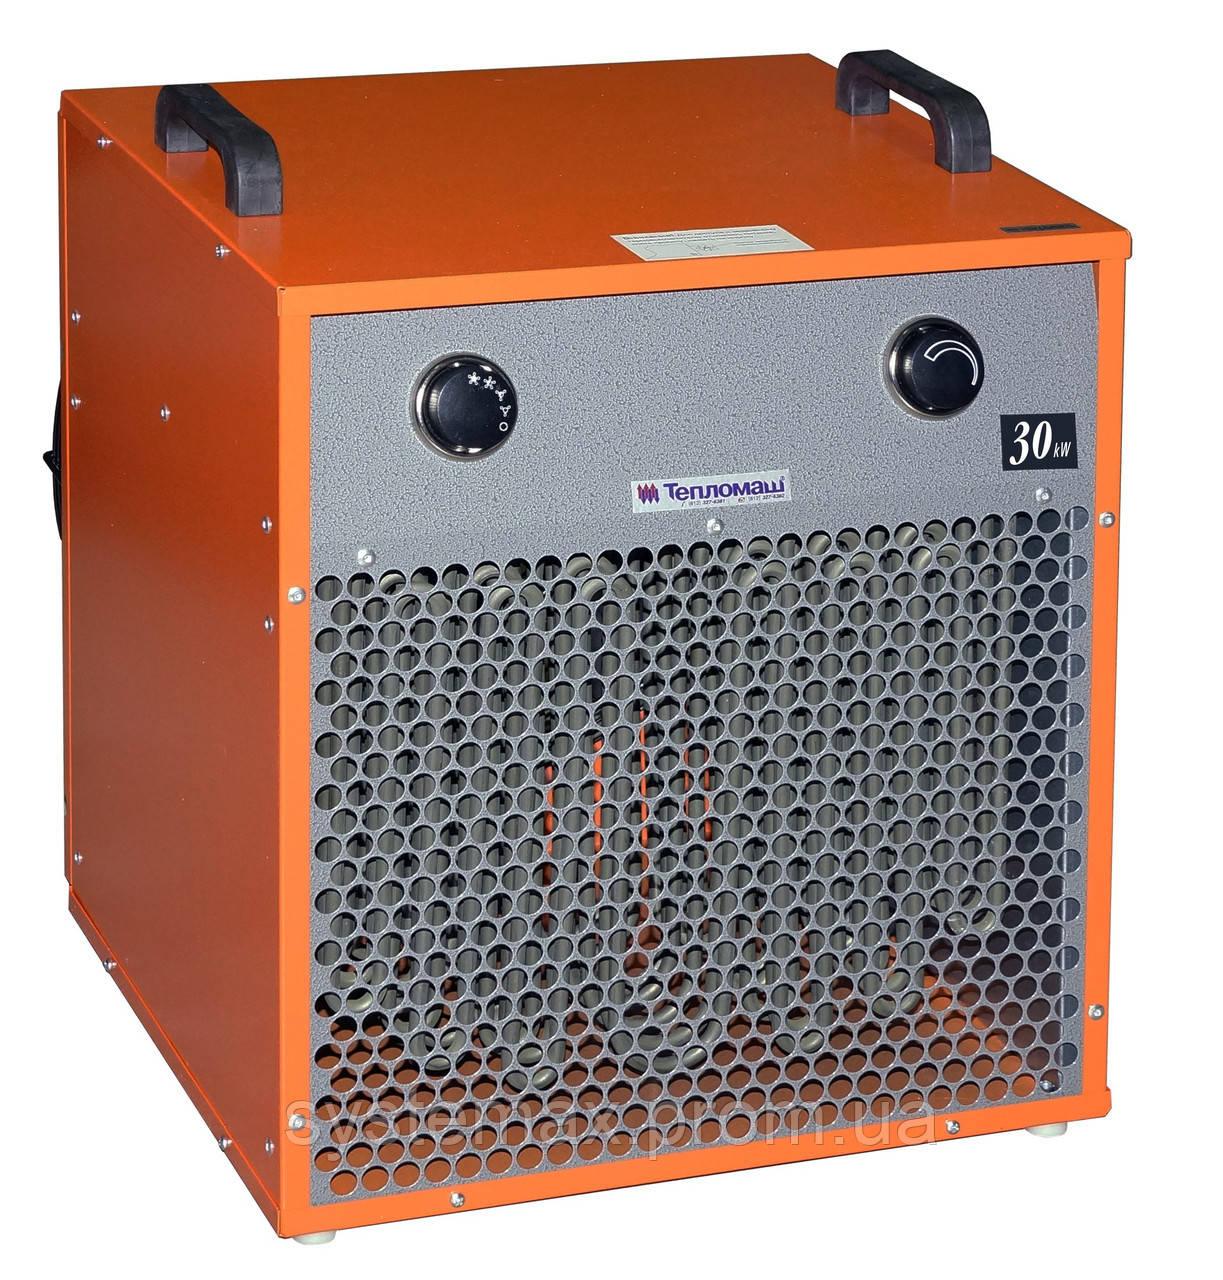 Тепломаш КЭВ-30Т23Е (КЭВ 30Т23Е) 30 кВт - тепловентилятор (тепловая пушка)